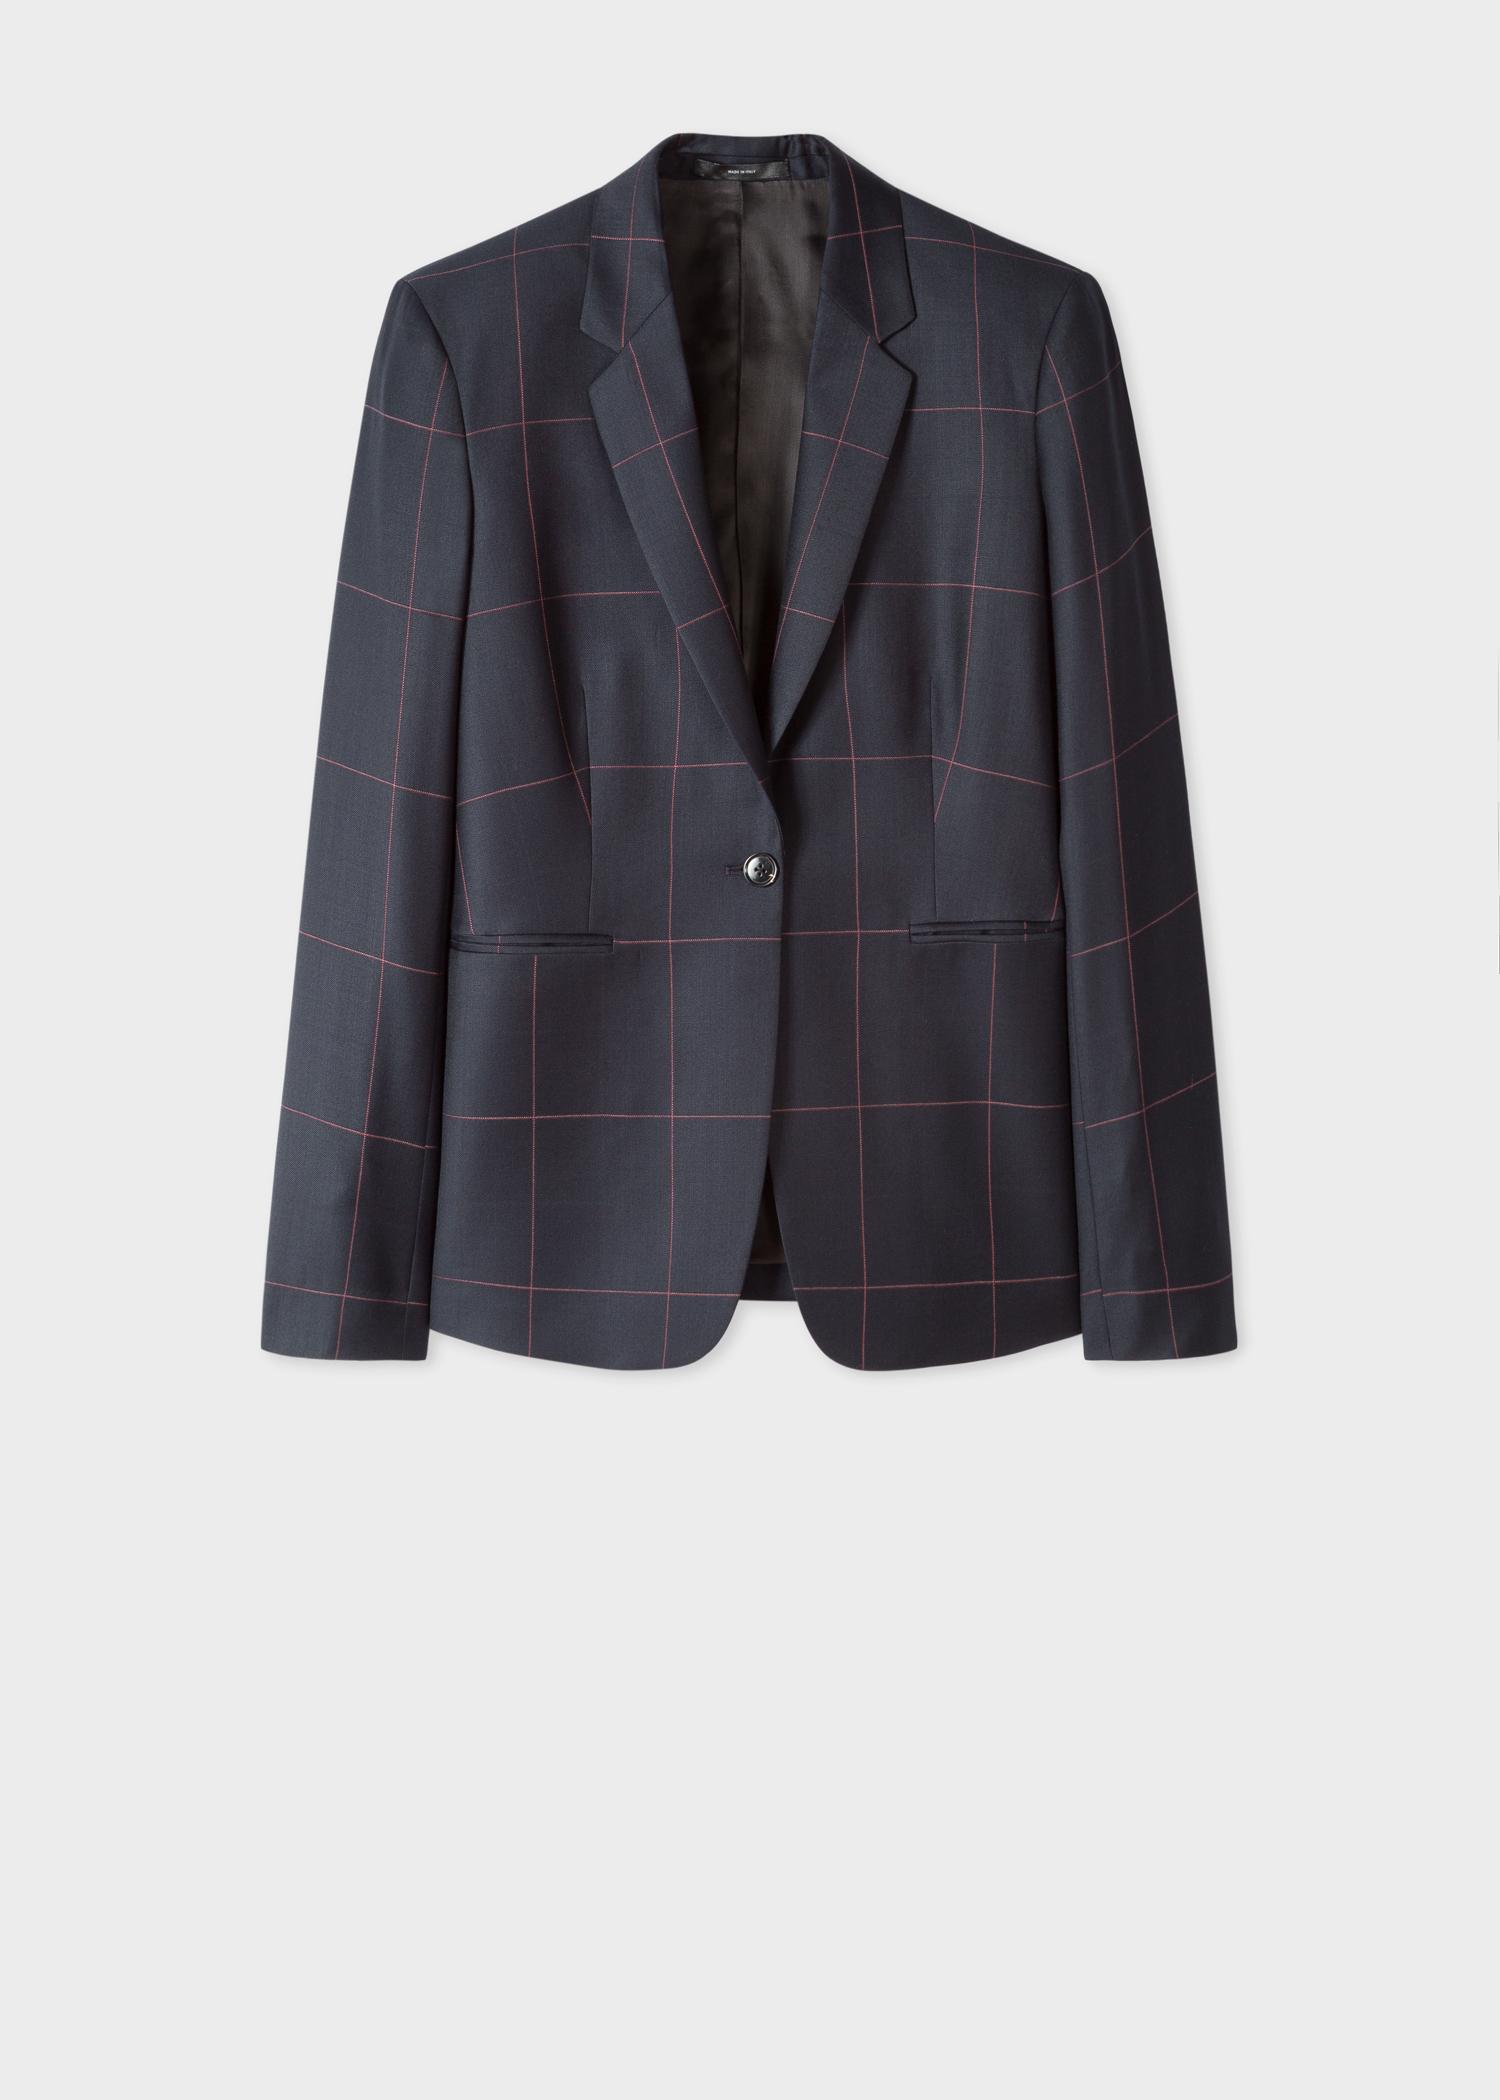 0fcc2ad84479 Front view - Women's Slim-Fit Dark Navy Windowpane Check Wool Blazer Paul  Smith